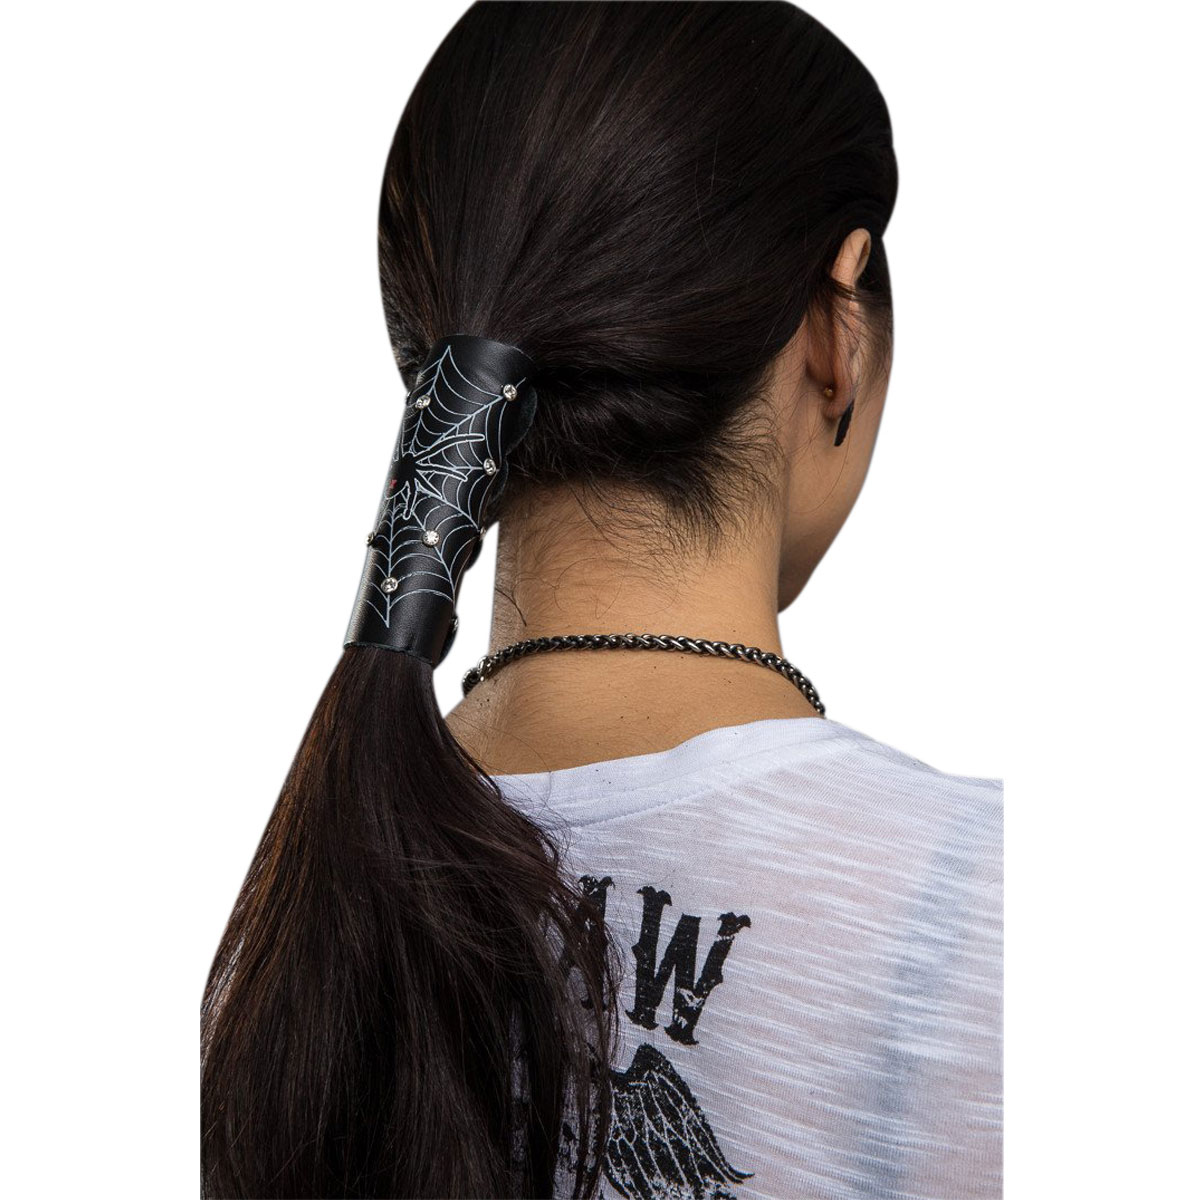 Enjoyable Hair Glove Spider Web Rhinestones Hair Glove 31466 Jpcycles Com Natural Hairstyles Runnerswayorg